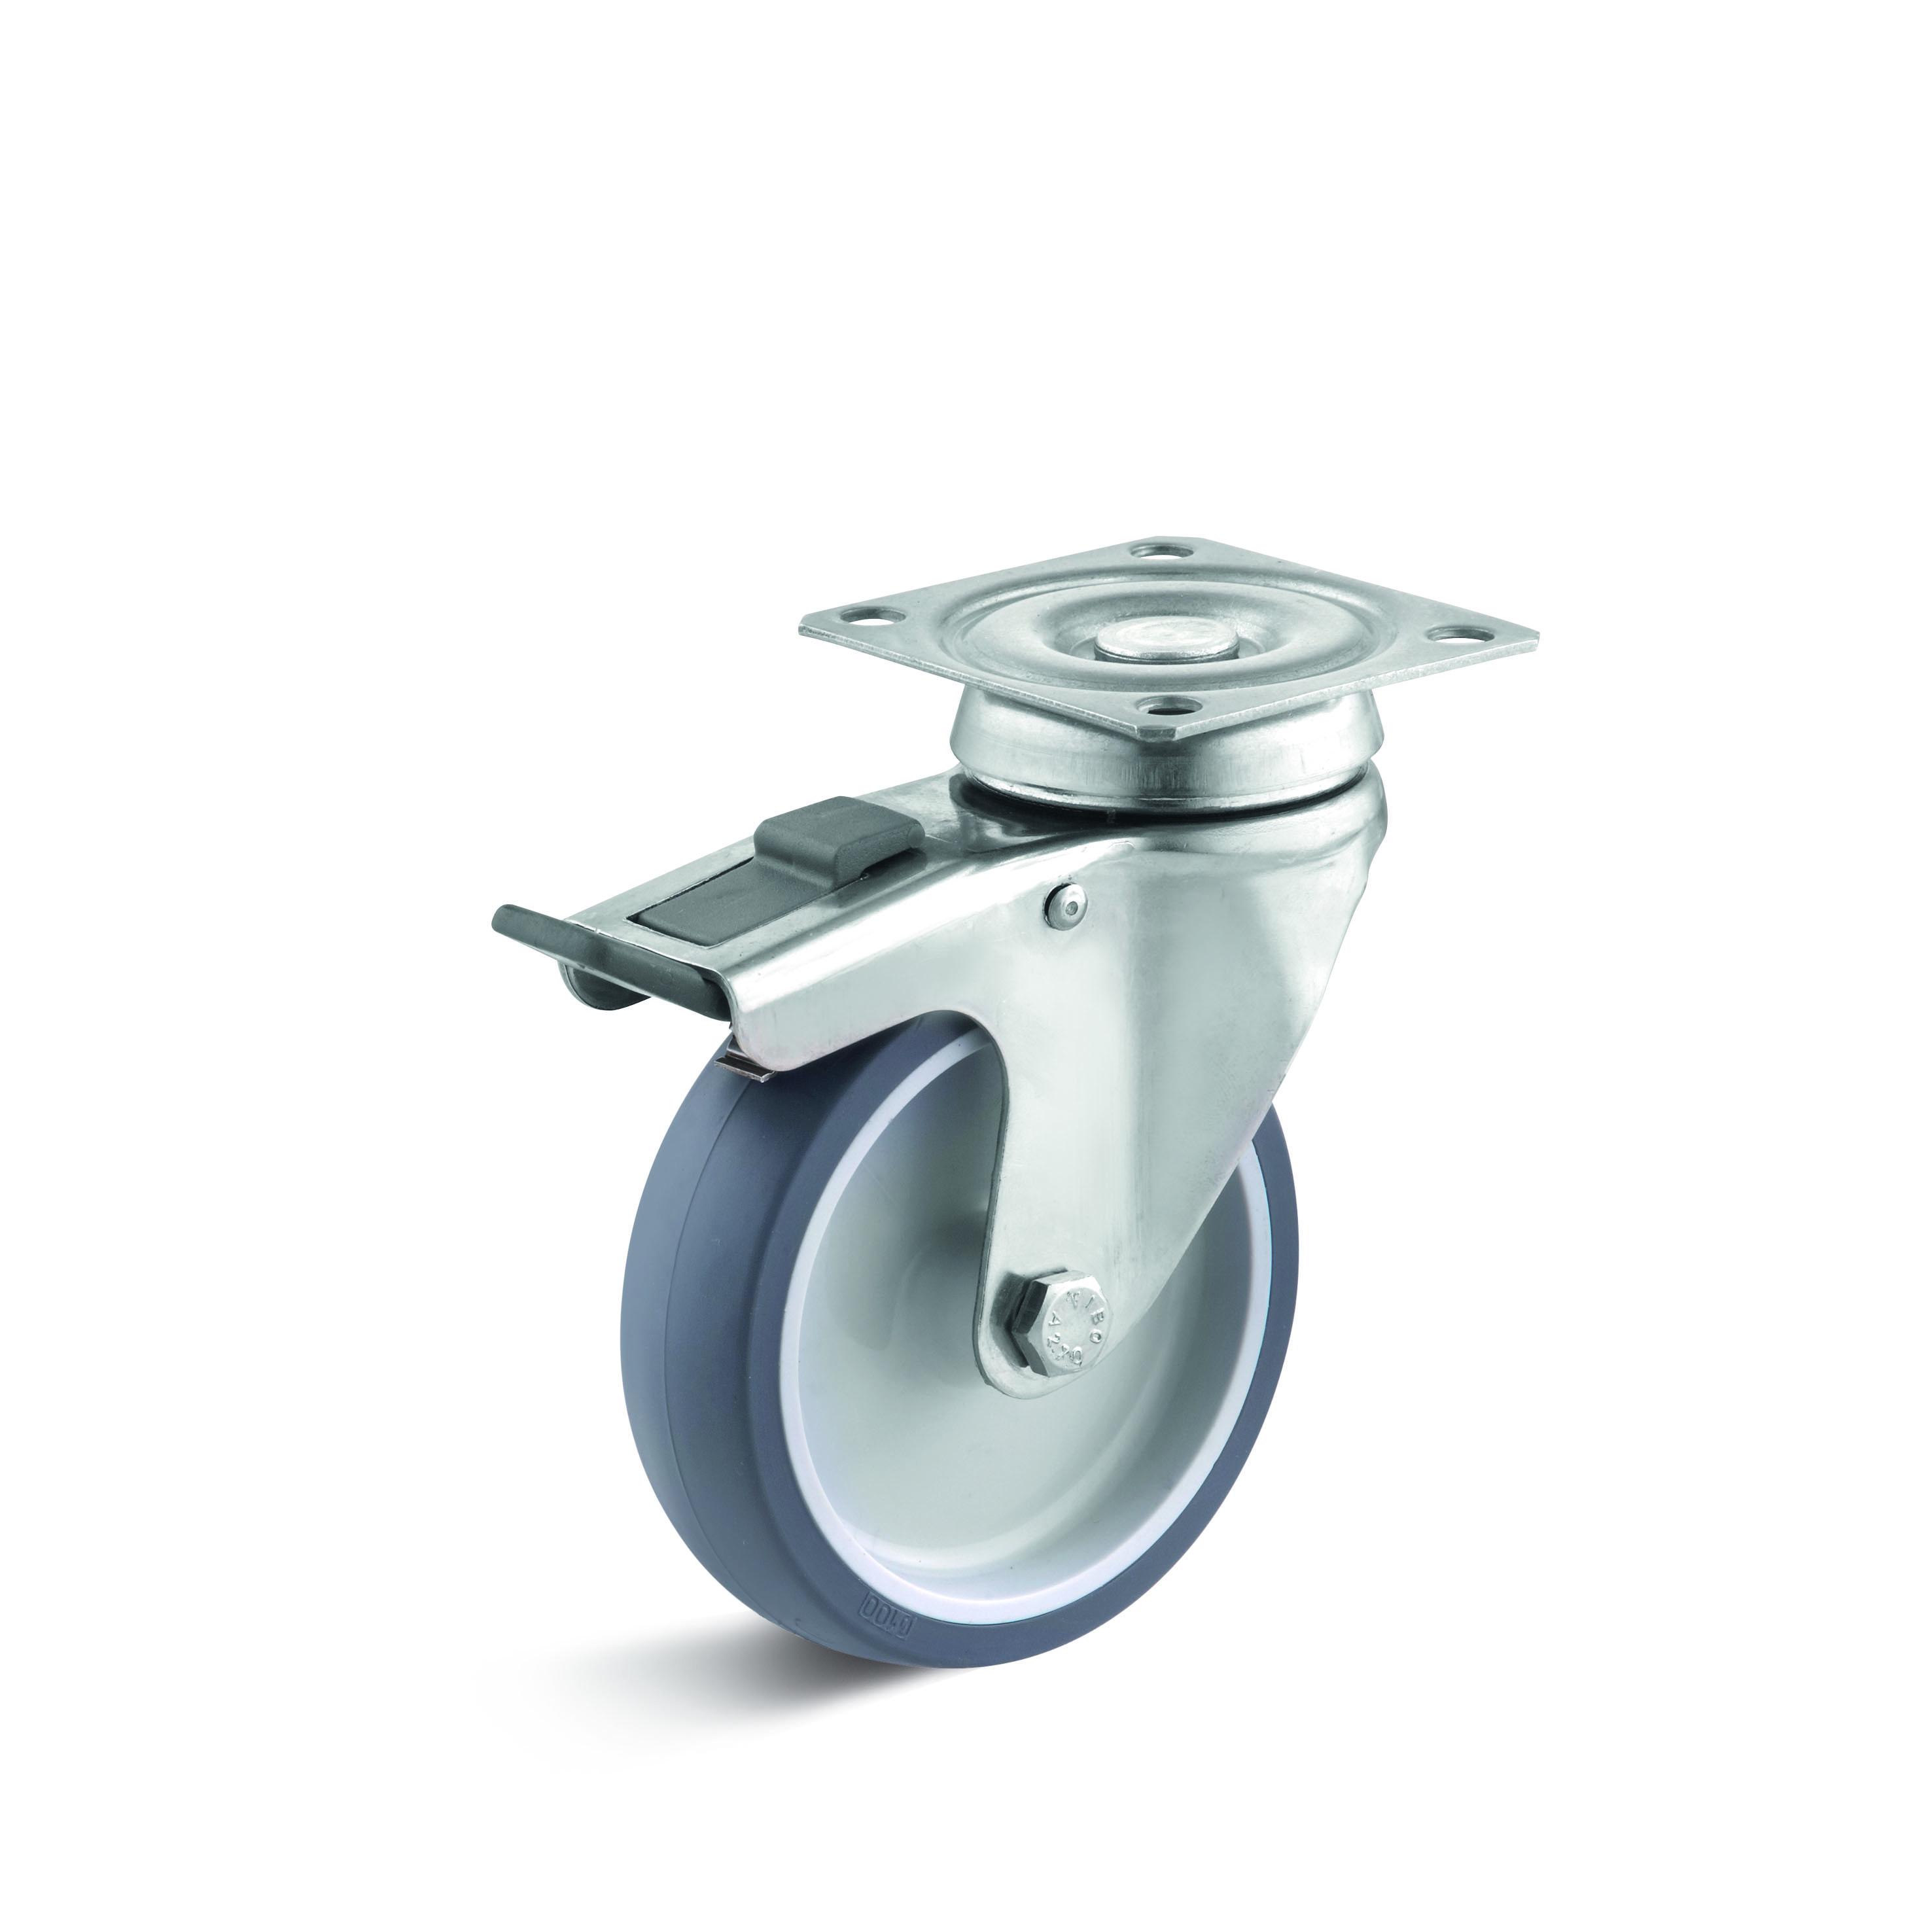 Billed af Rustfrie apparathjul, grå thermoplasthjul, rustfri gaffel, (9050-serie)